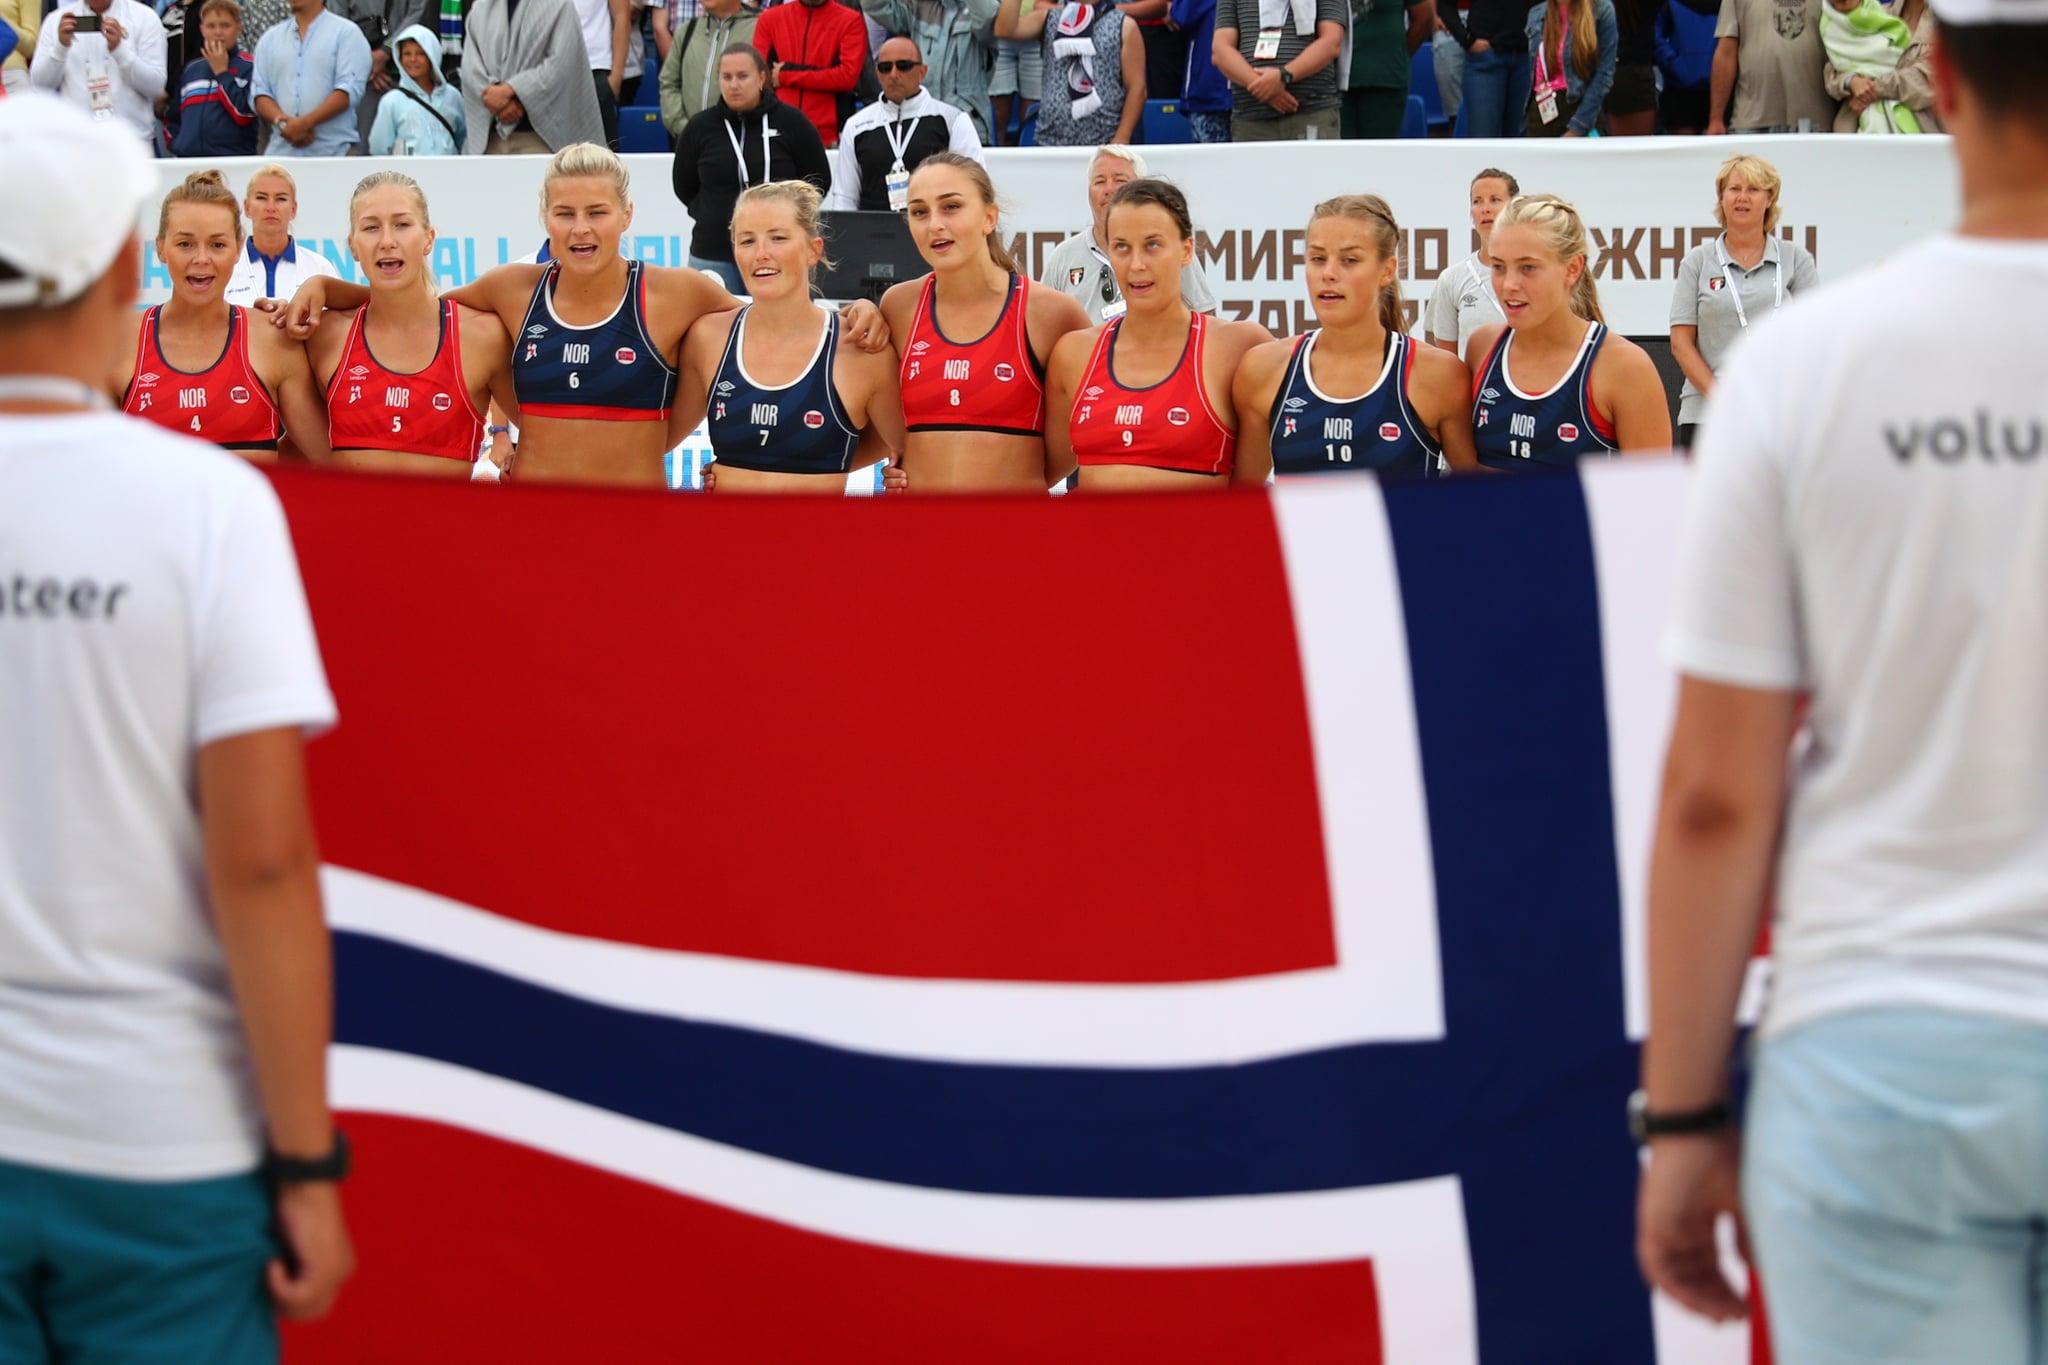 KAZAN, RUSSIA - JULY 29: Norway team line up during 2018 Women's Beach Handball World Cup final against Greece on July 29, 2018 in Kazan, Russia. (Photo by Ilnar Tukhbatov/Epsilon/Getty Images)